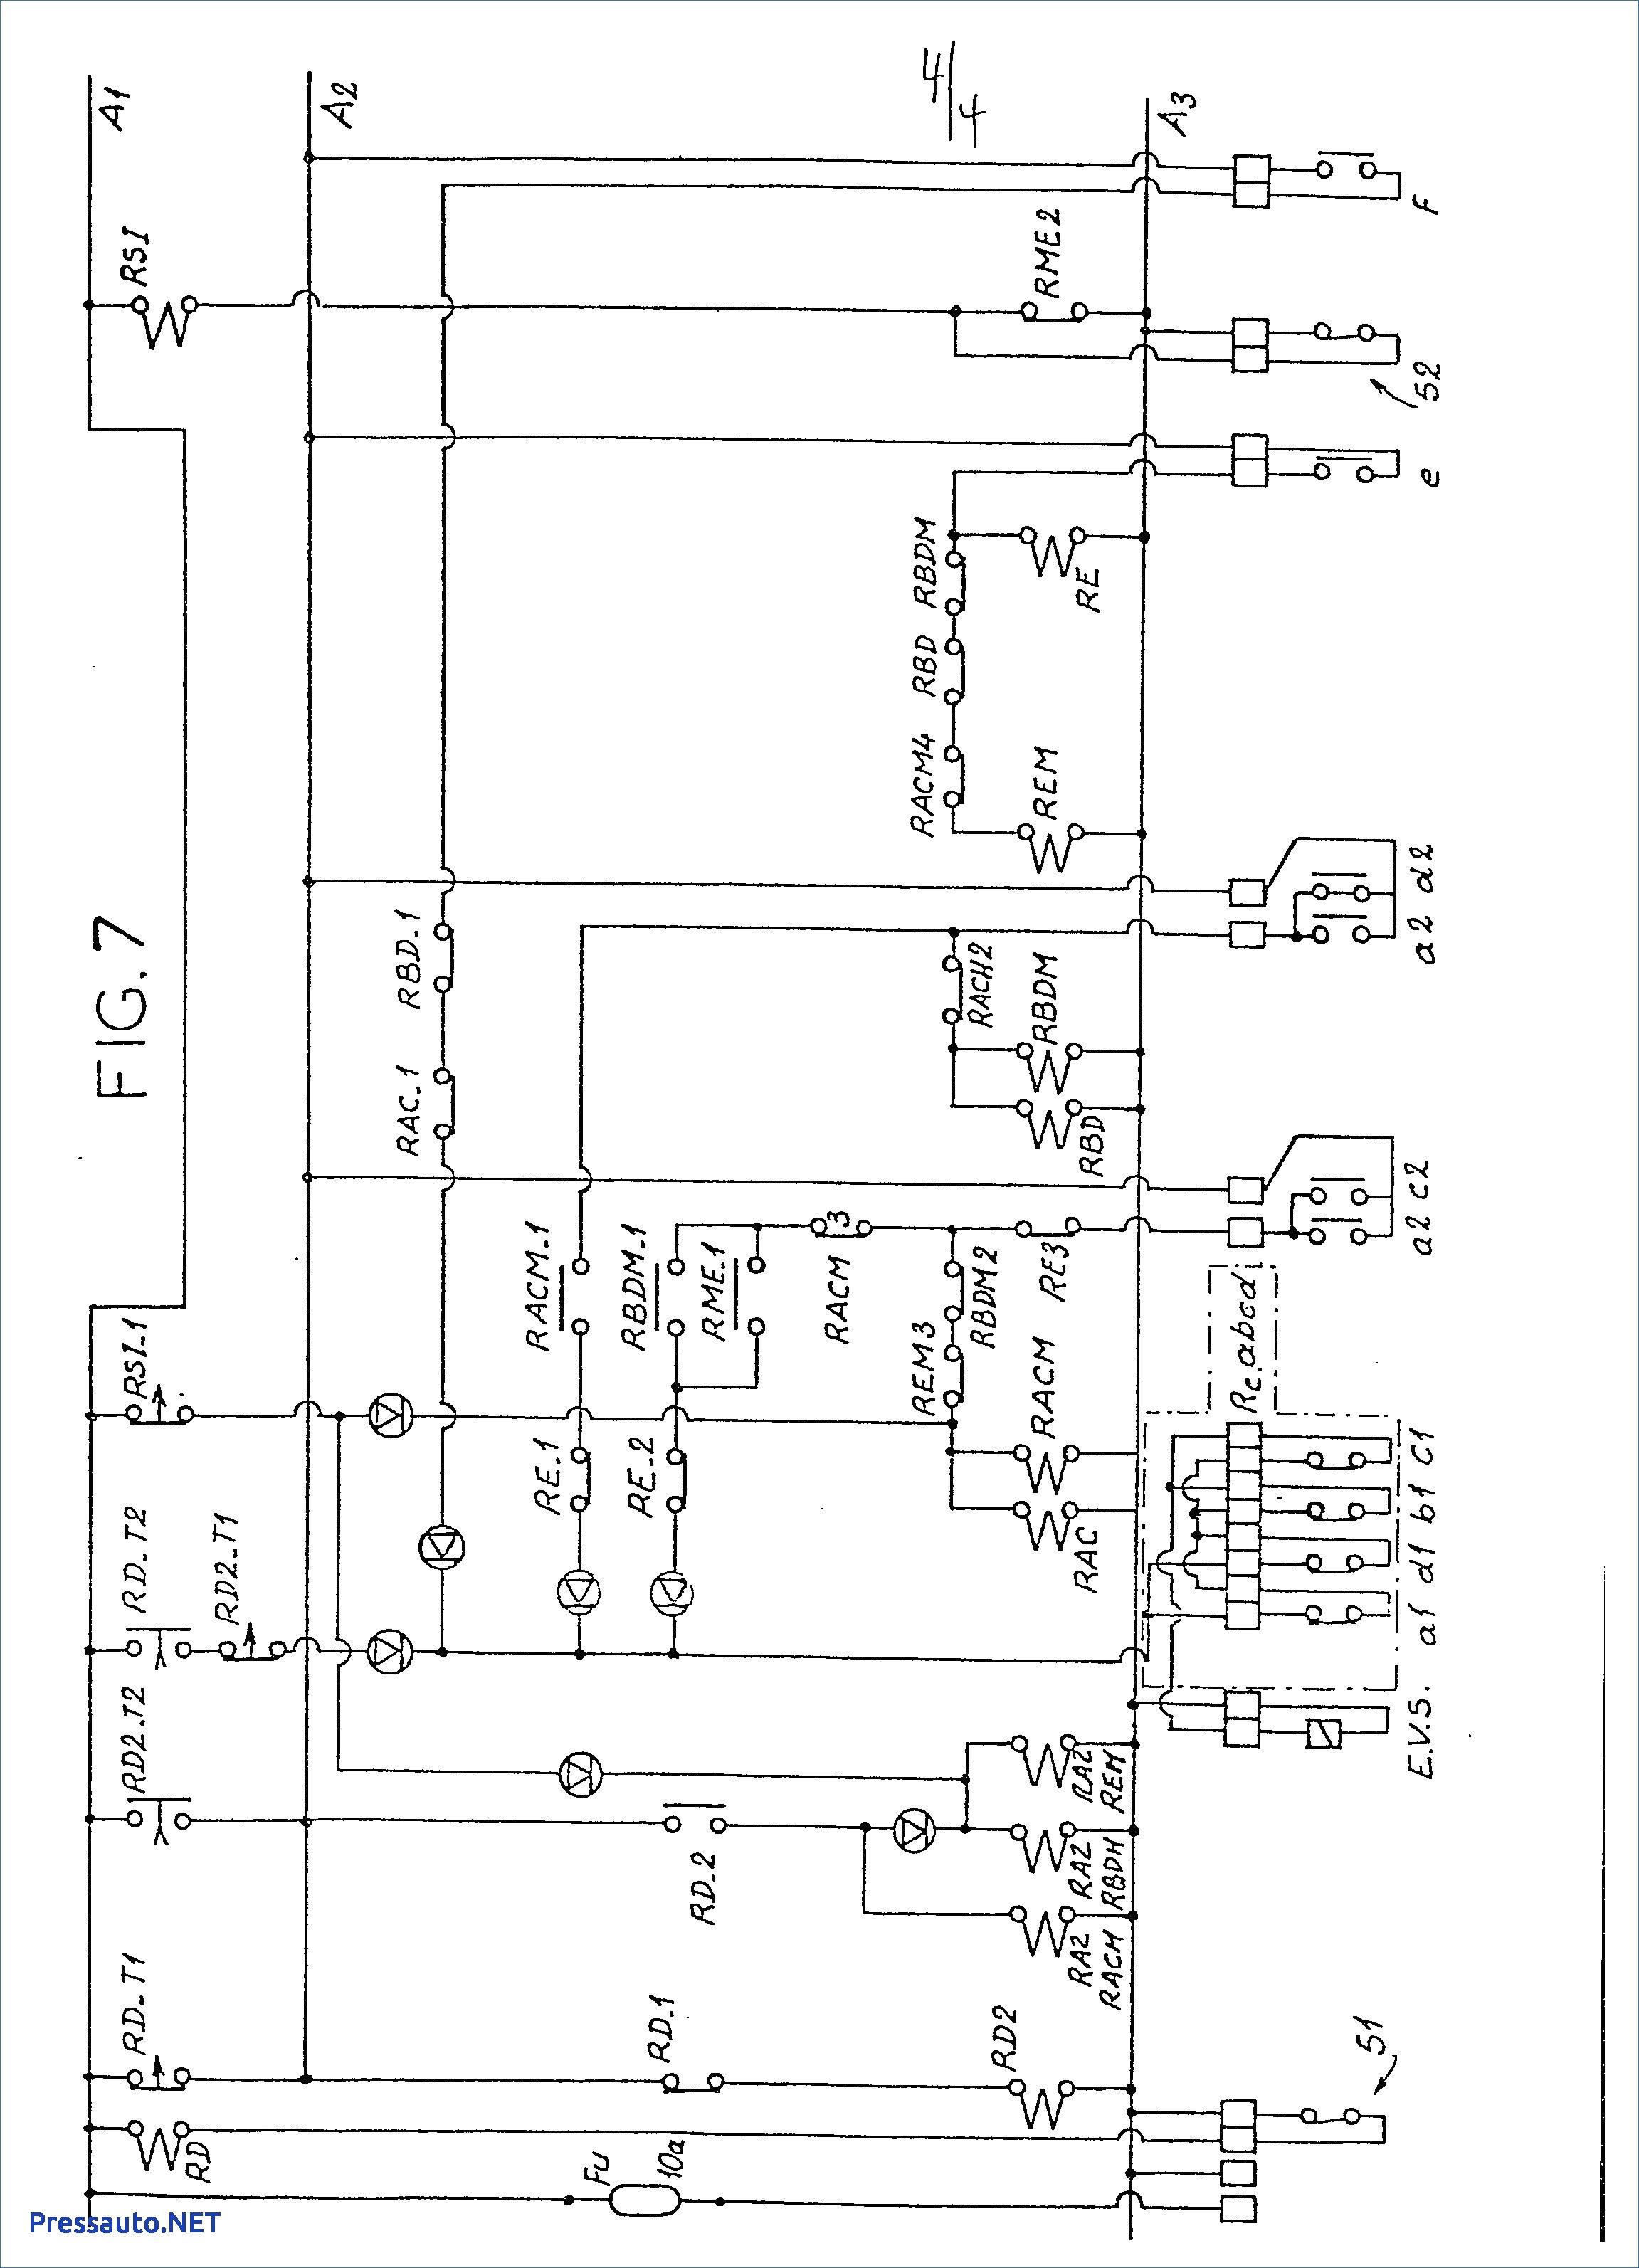 [SCHEMATICS_48EU]  Demag Dc Chain Hoist Diagram - Volvo S60 Trunk Fuse Box Diagram for Wiring  Diagram Schematics | Demag Wiring Diagram |  | Wiring Diagram Schematics